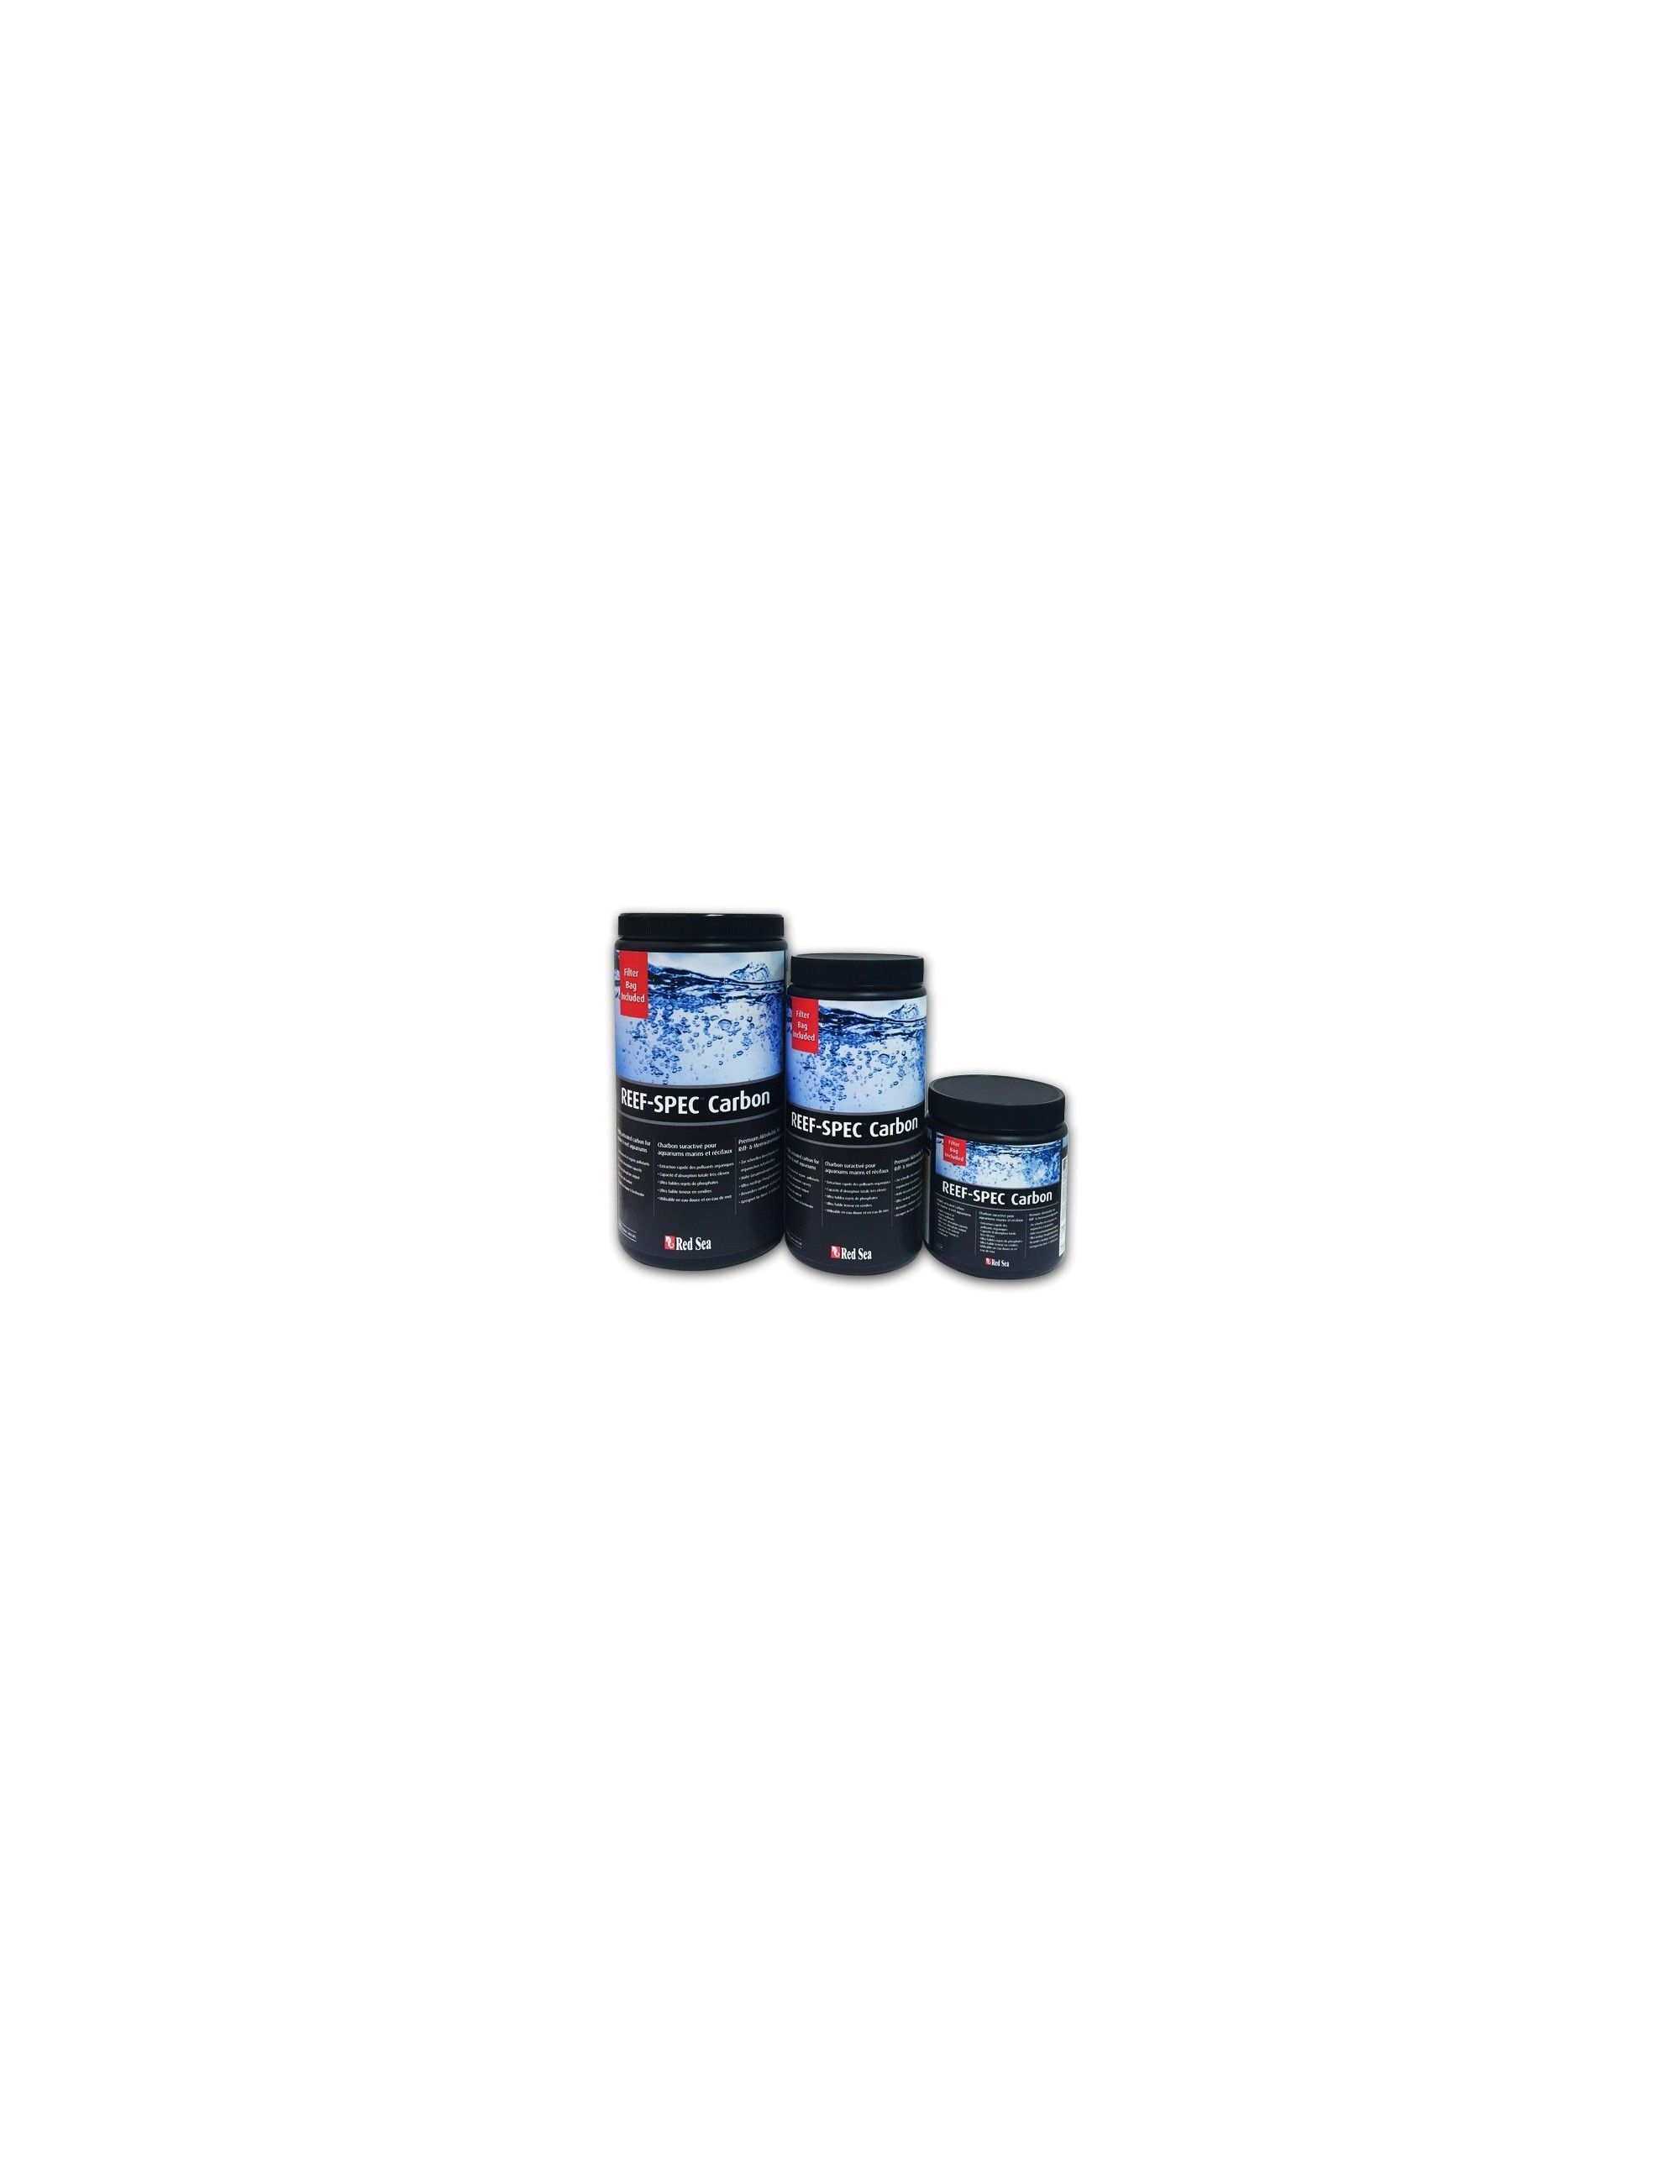 RED SEA -  REEF-SPEC™ Carbon 500ml